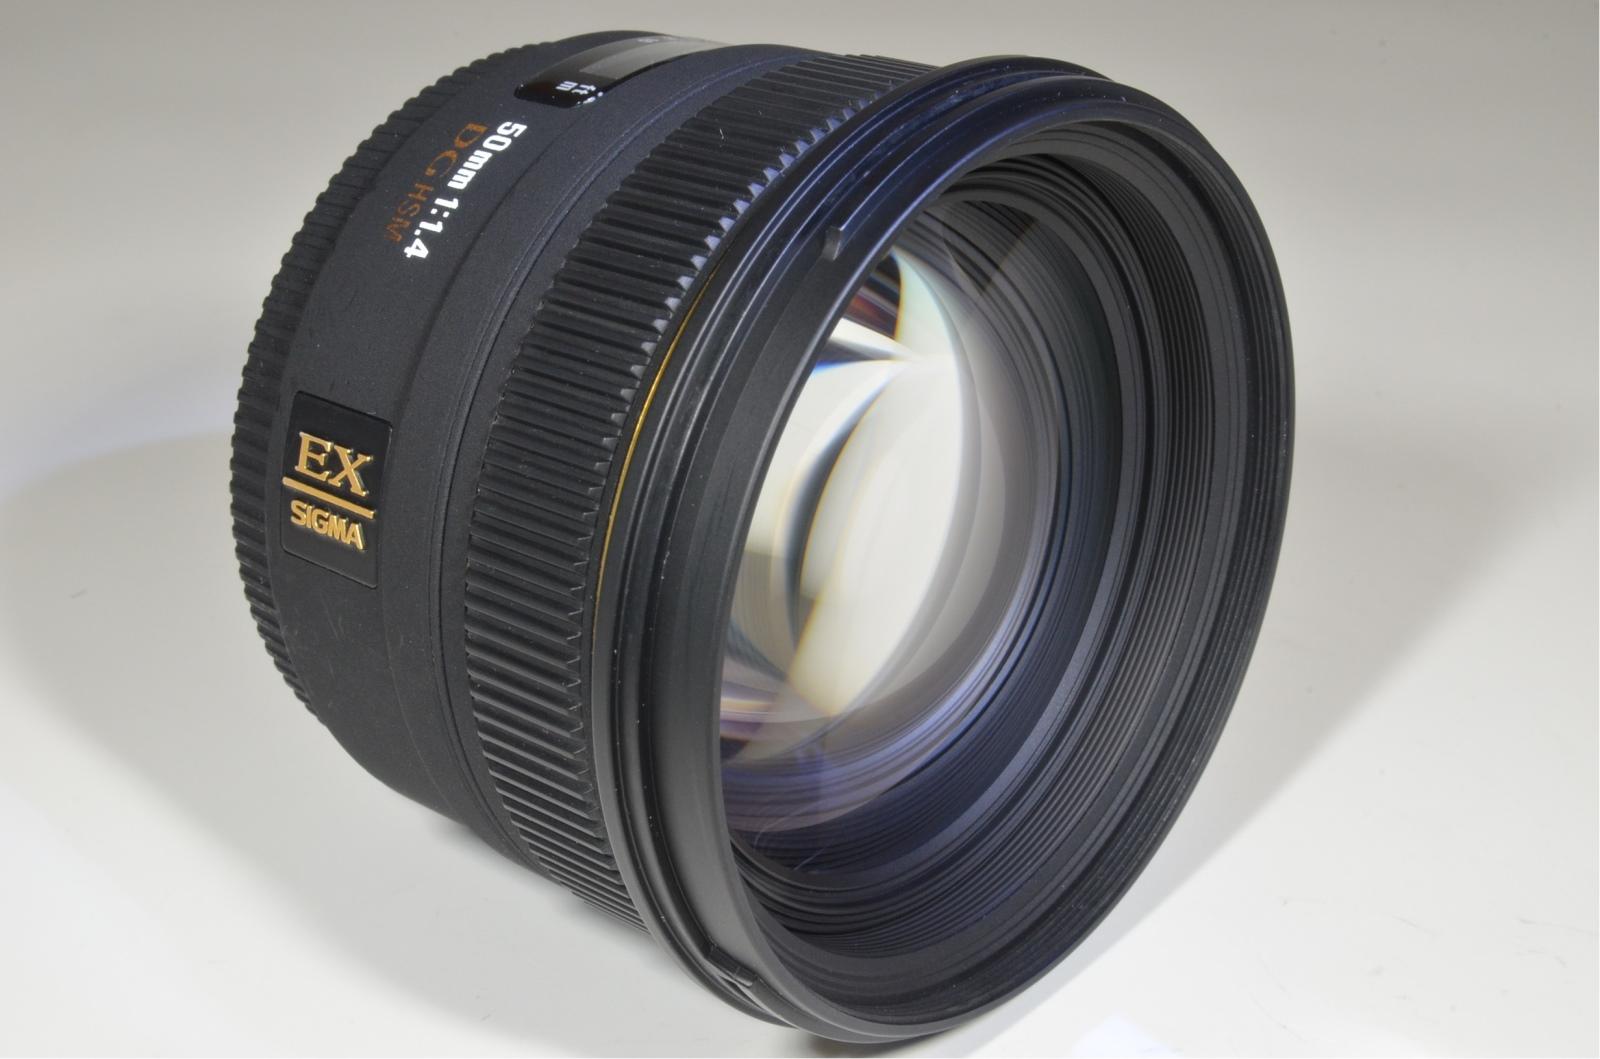 sigma 50mm f1.4 ex dg hsm for nikon